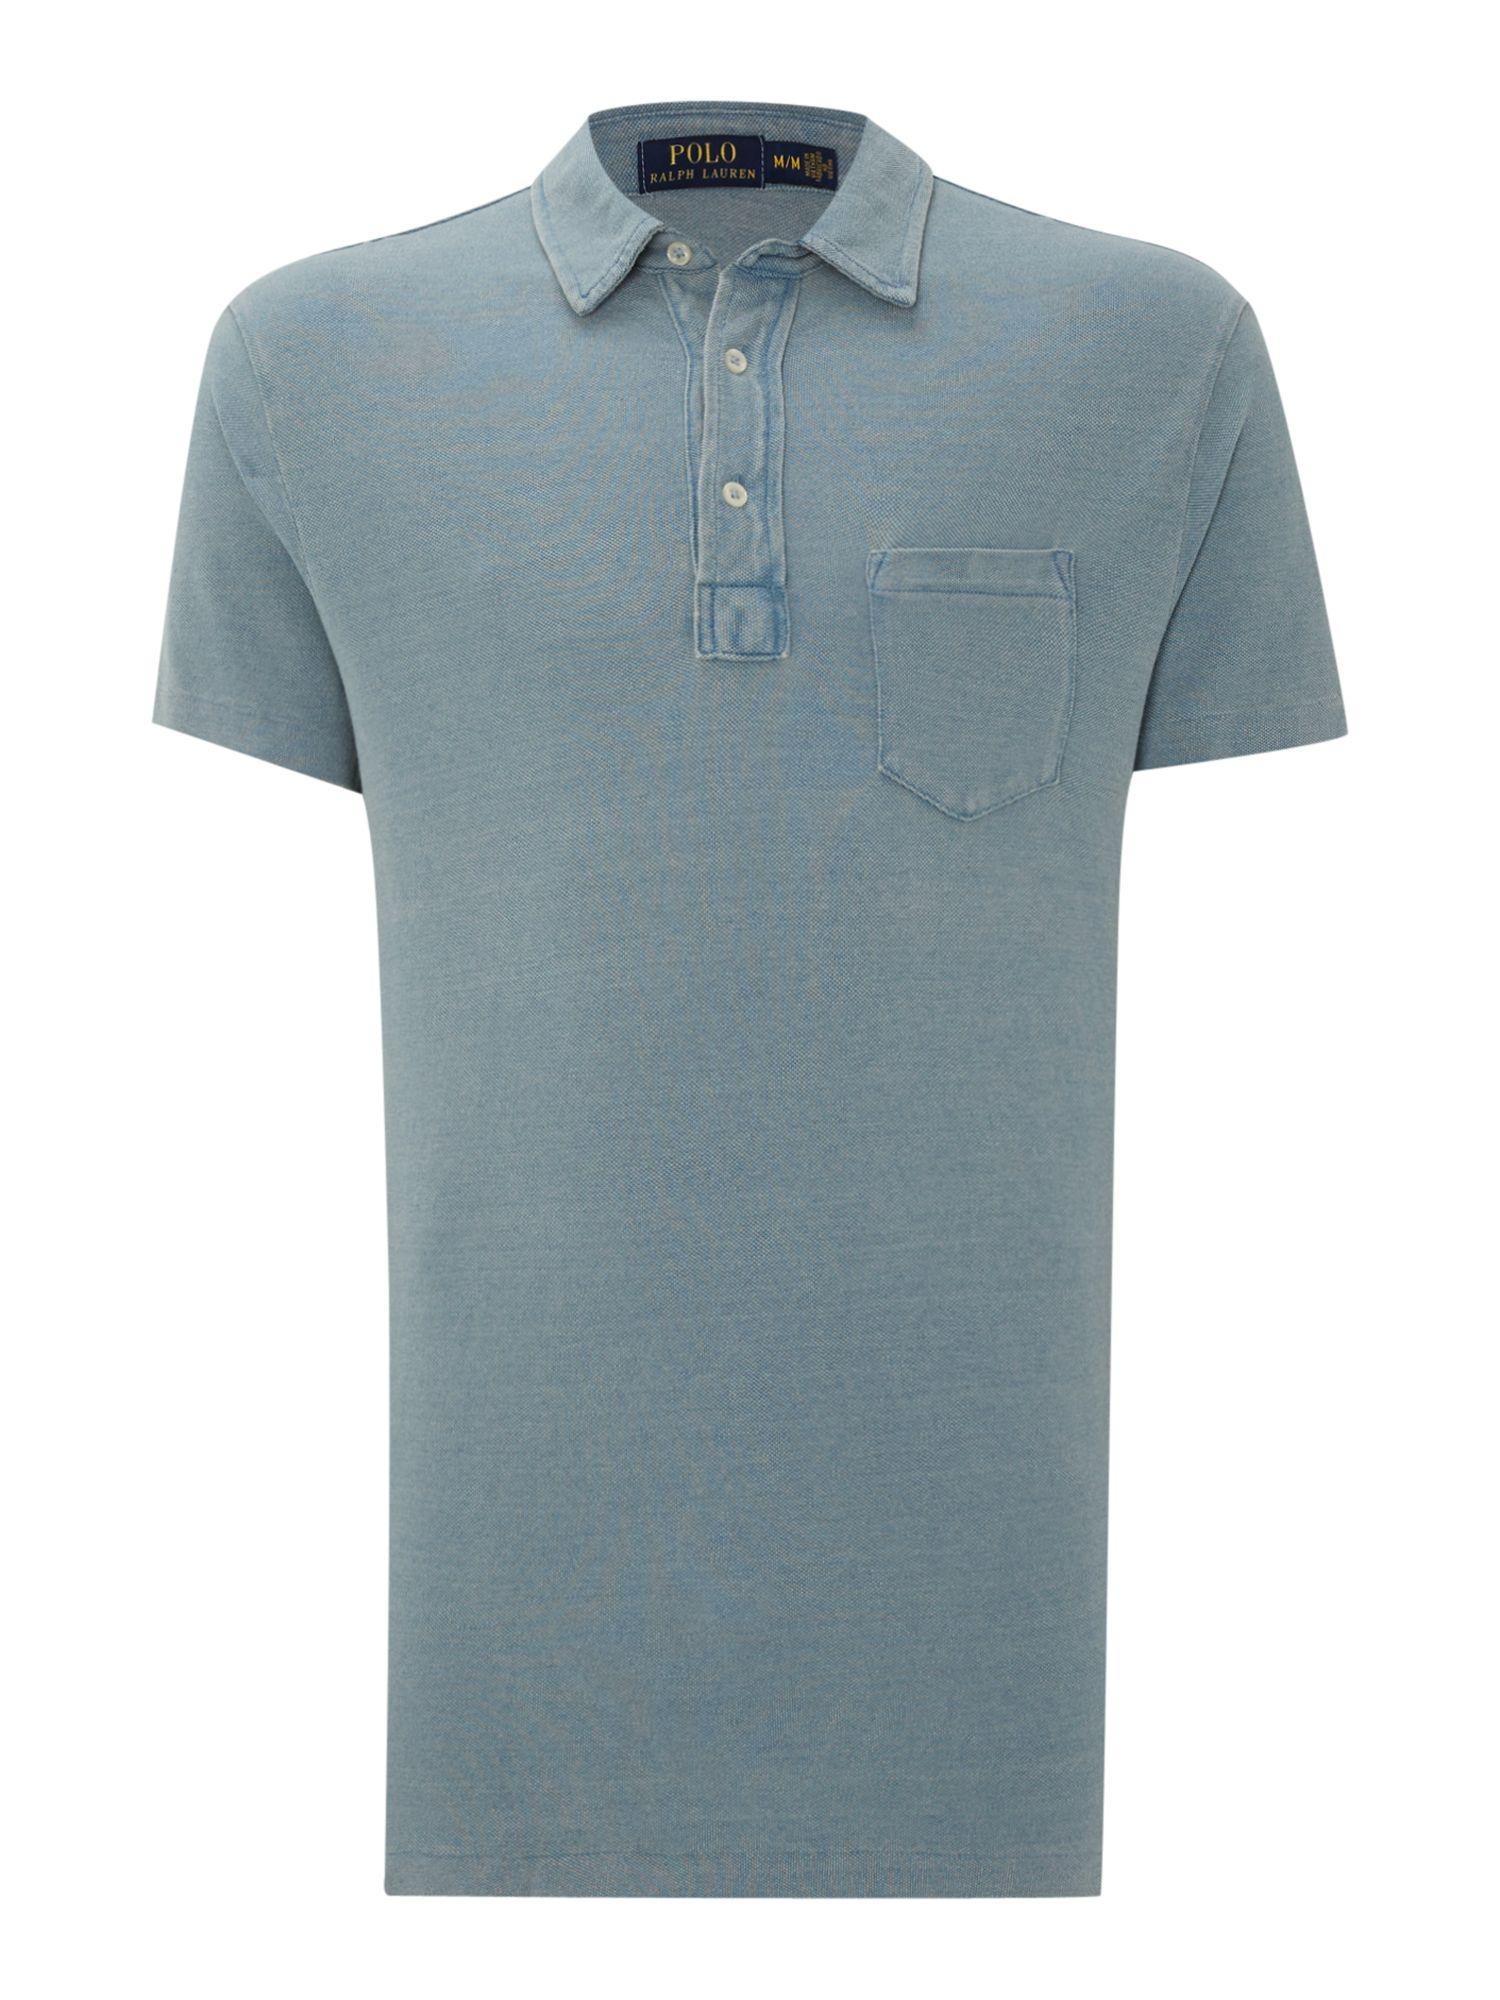 Polo Ralph Lauren Custom Fit Short Sleeve Mesh Polo Shirt